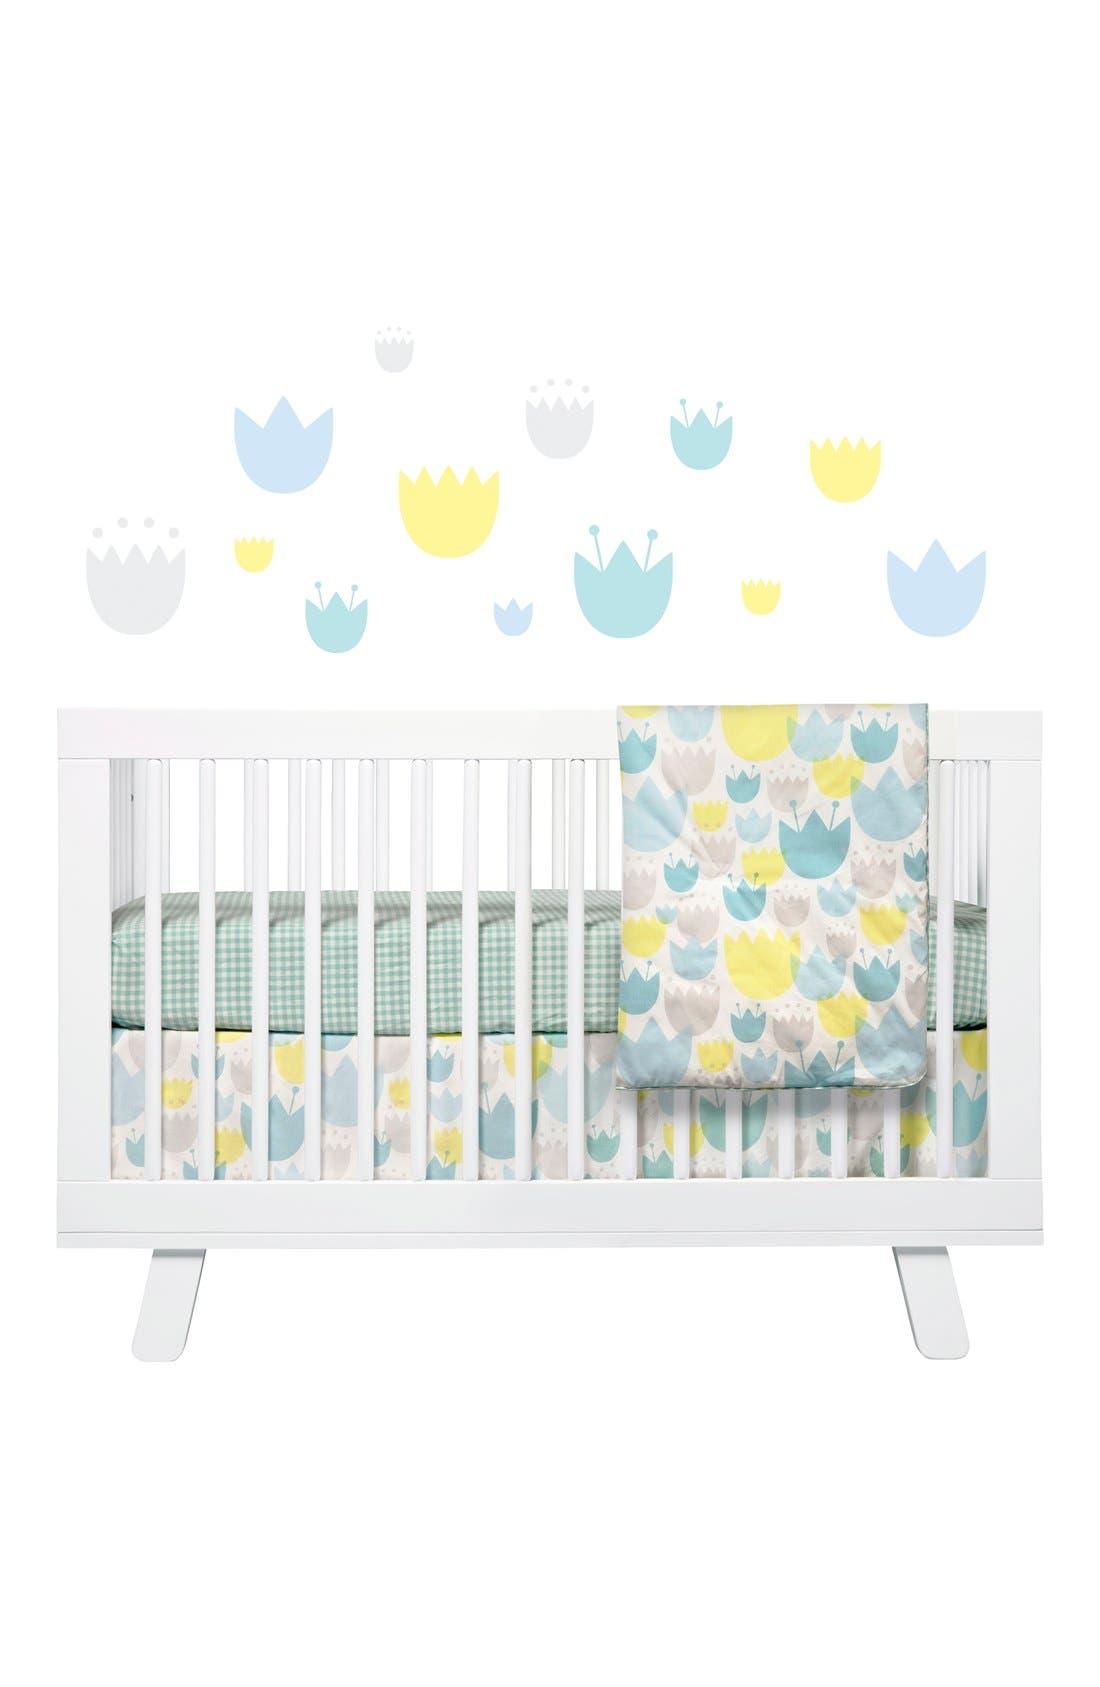 'Garden' Crib Sheet, Crib Skirt, Stroller Blanket & Wall Decals,                             Main thumbnail 1, color,                             Blue